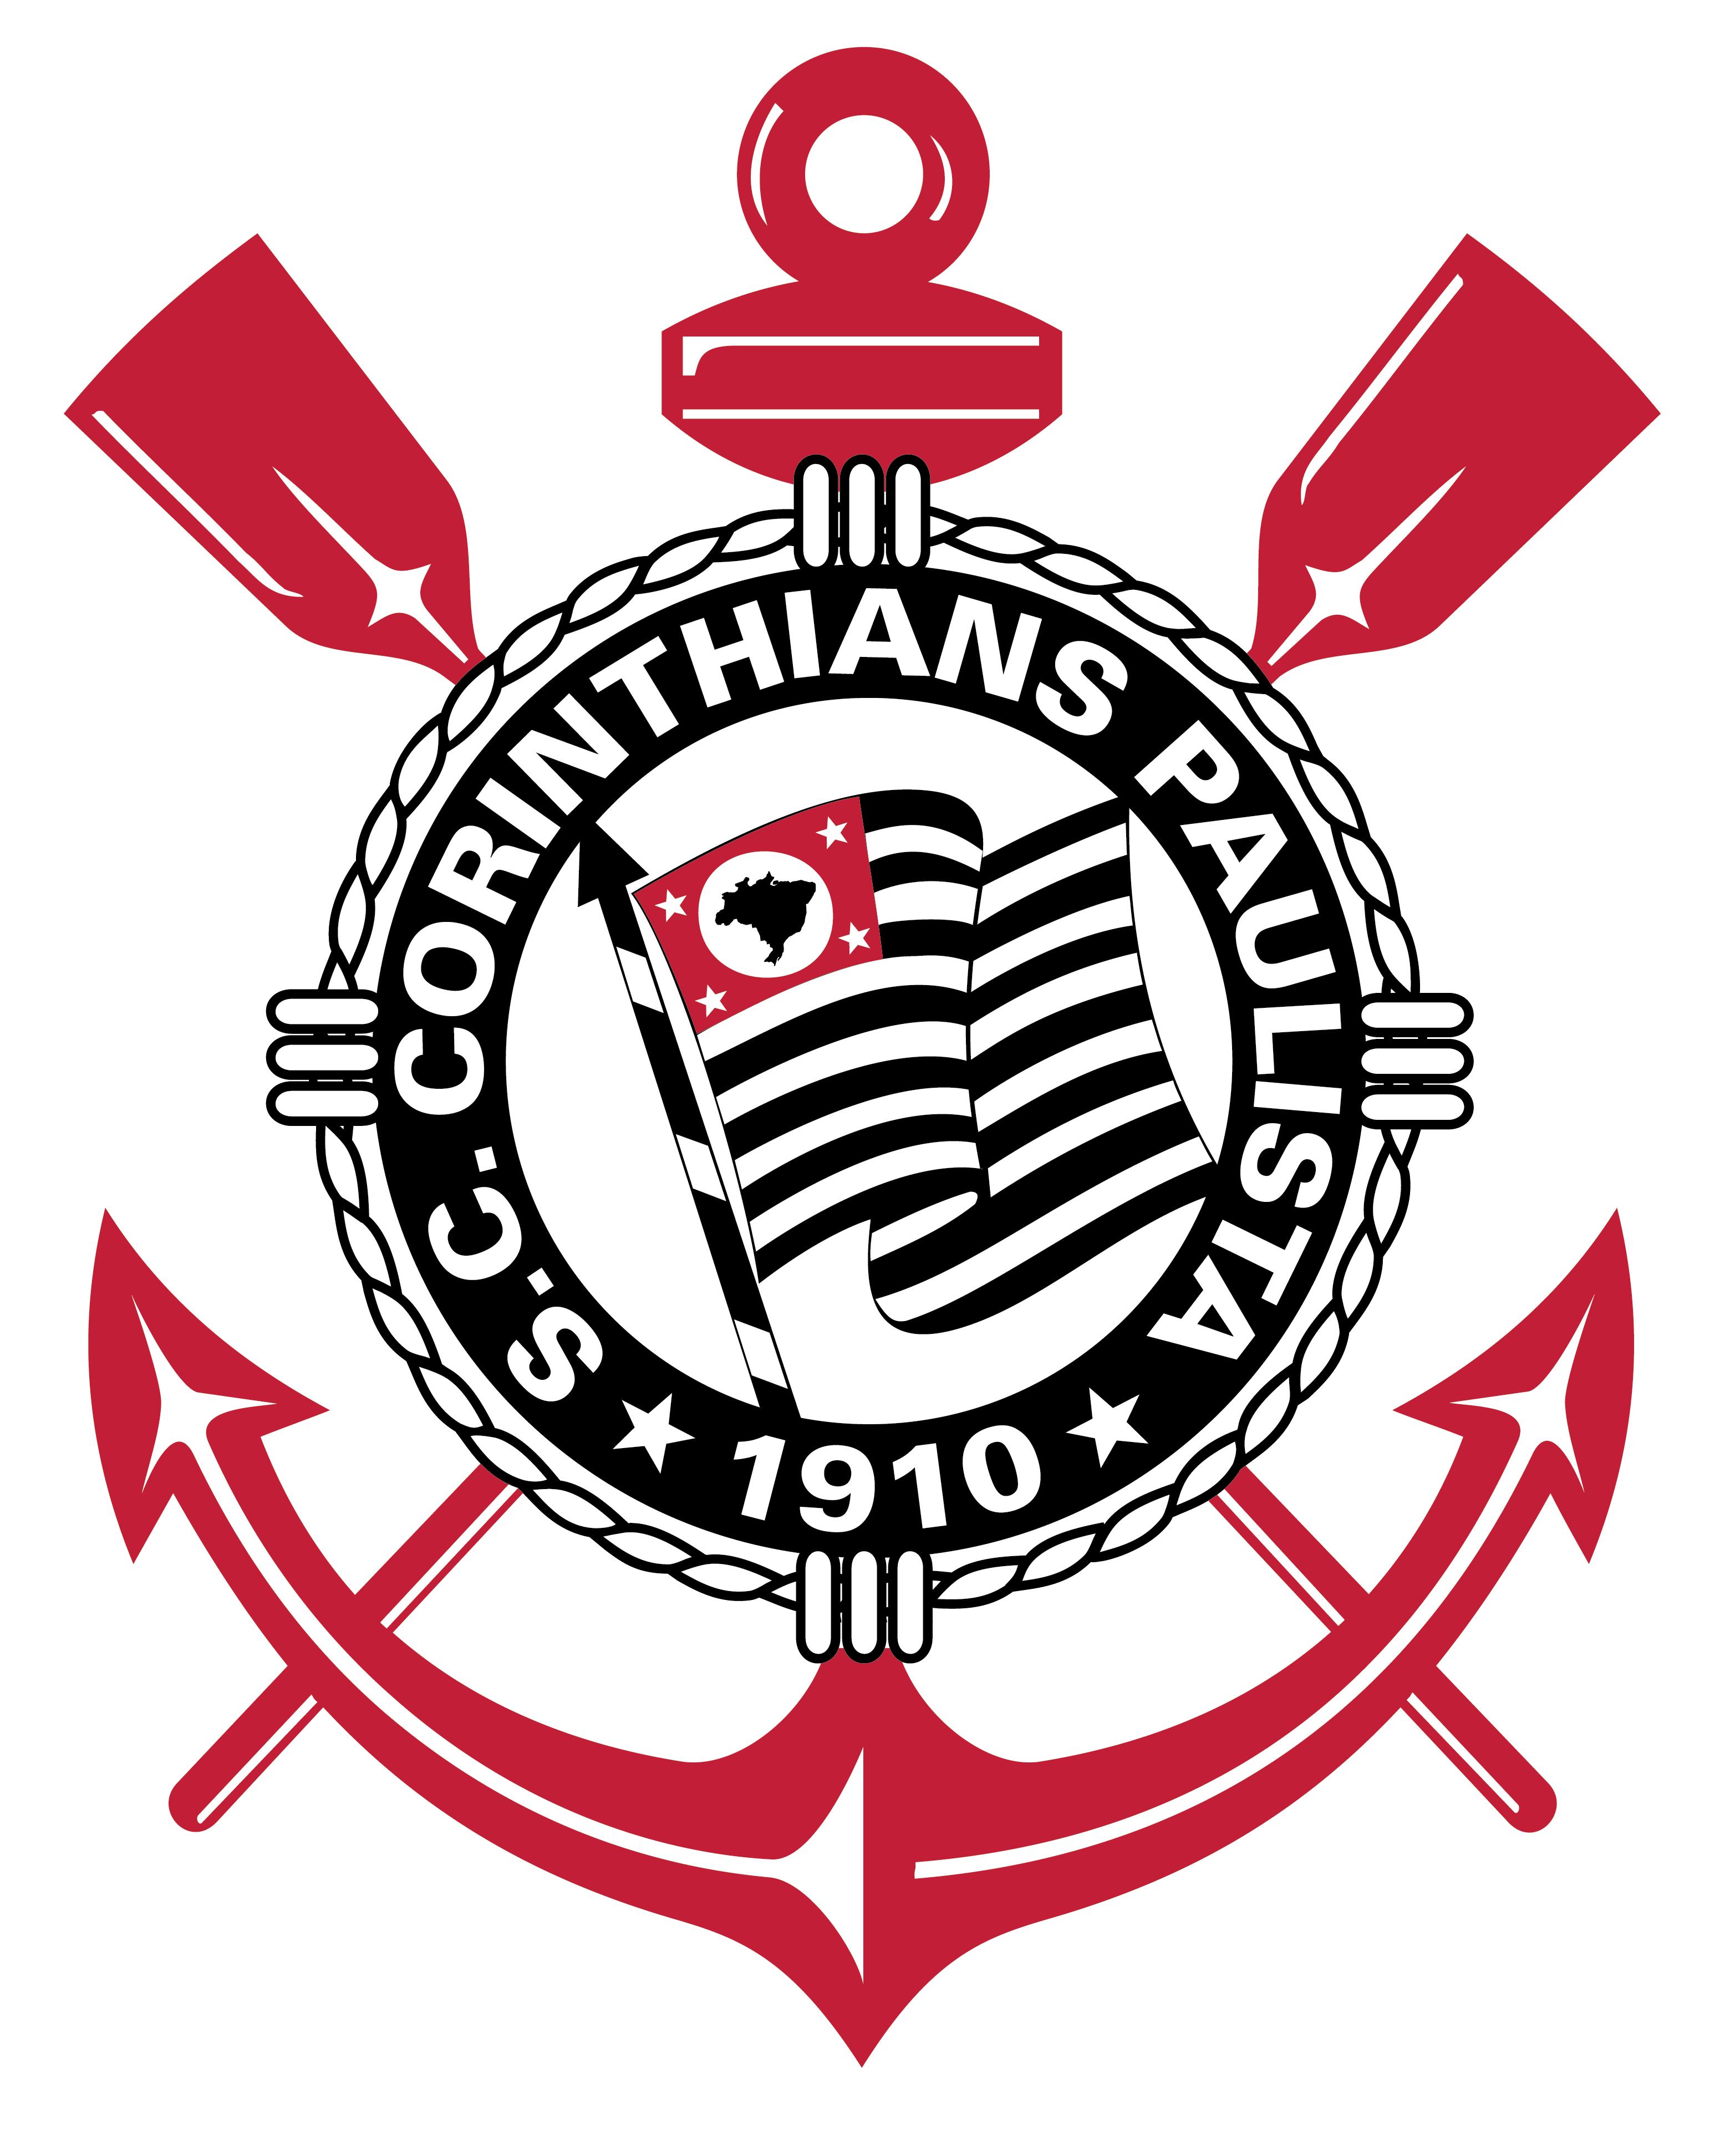 Giga do Corinthians